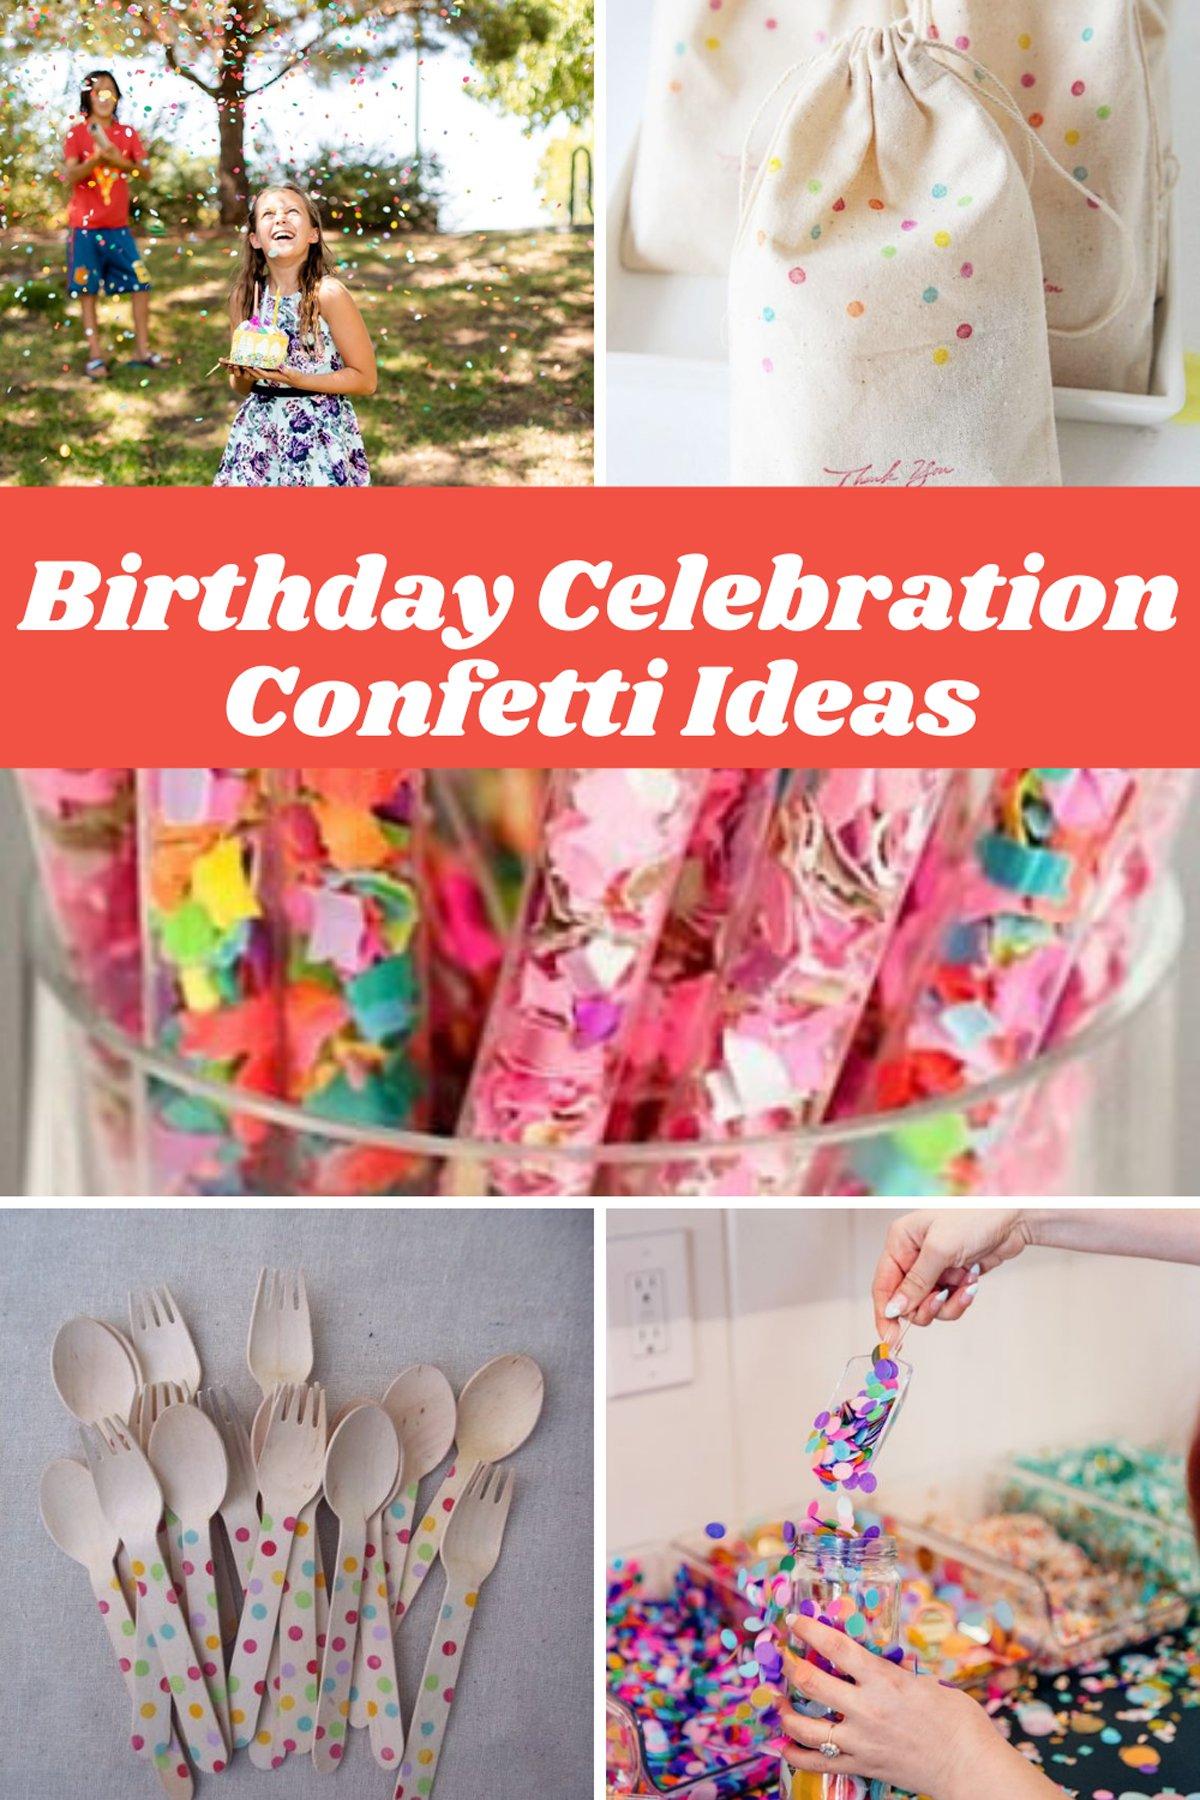 Fun Confetti Ideas for Birthdays Celebrations